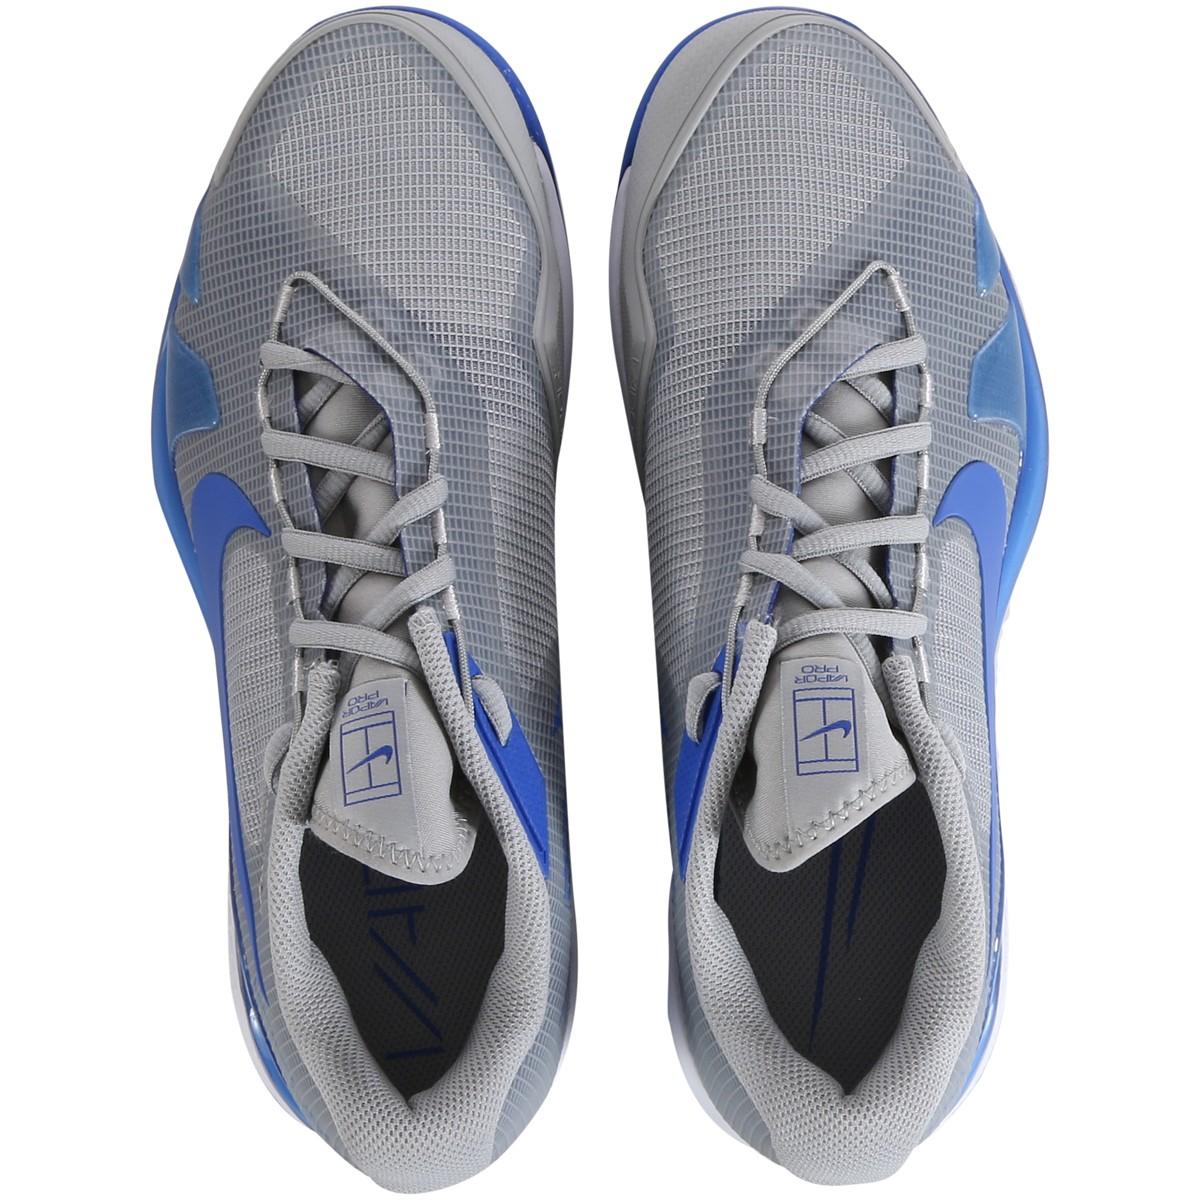 NIKE AIR ZOOM VAPOR PRO CLAY COURT SHOES - NIKE - Men's - Shoes ...